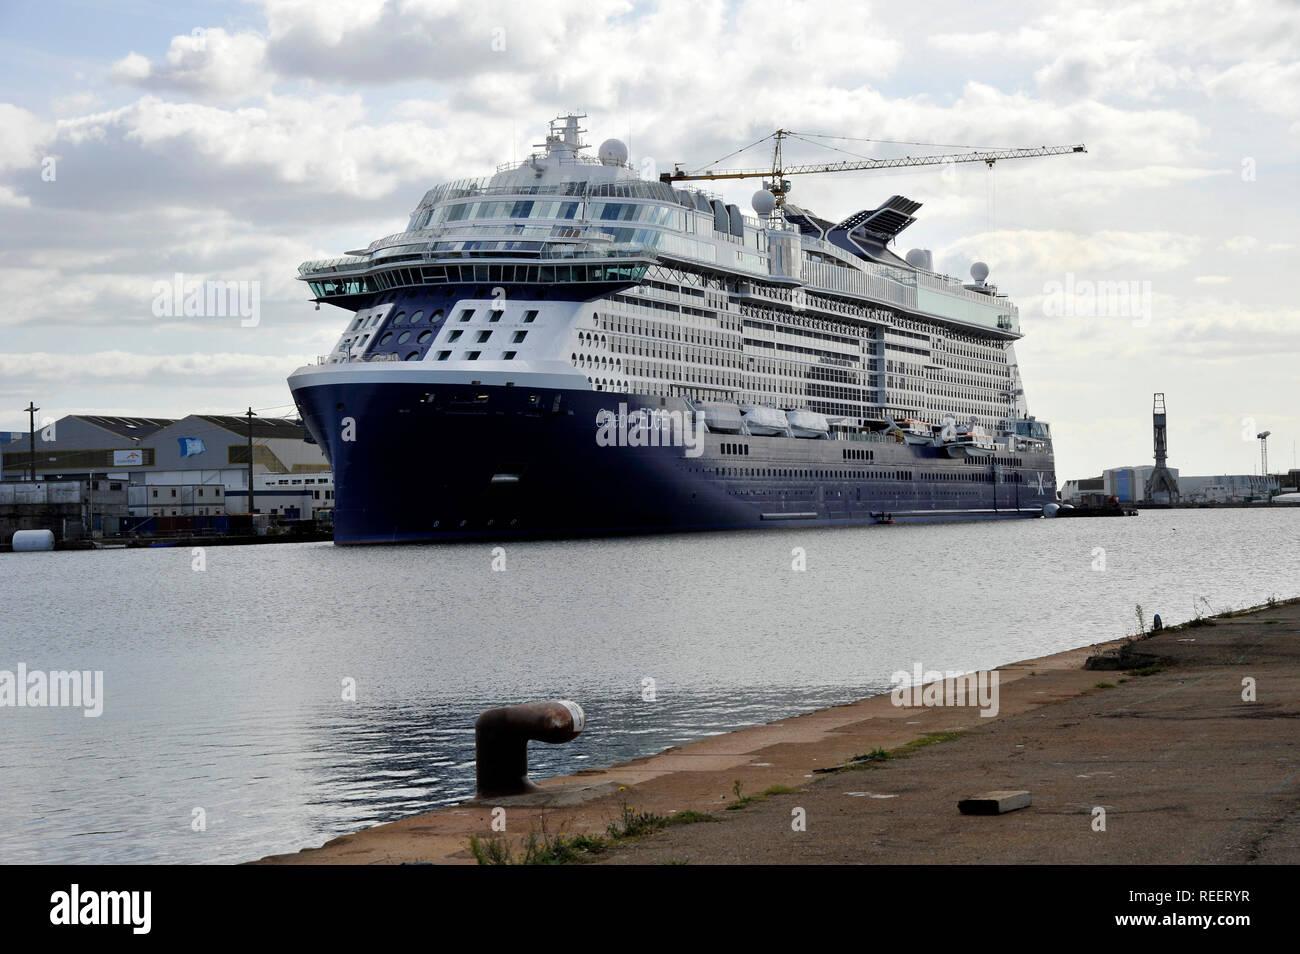 Saint-Nazaire (north-western France), on 2018/10/01: Celebrity Edge cruise ship, end of construction at the Òchantier naval de lÕAtlantiqueÓ shipyards - Stock Image